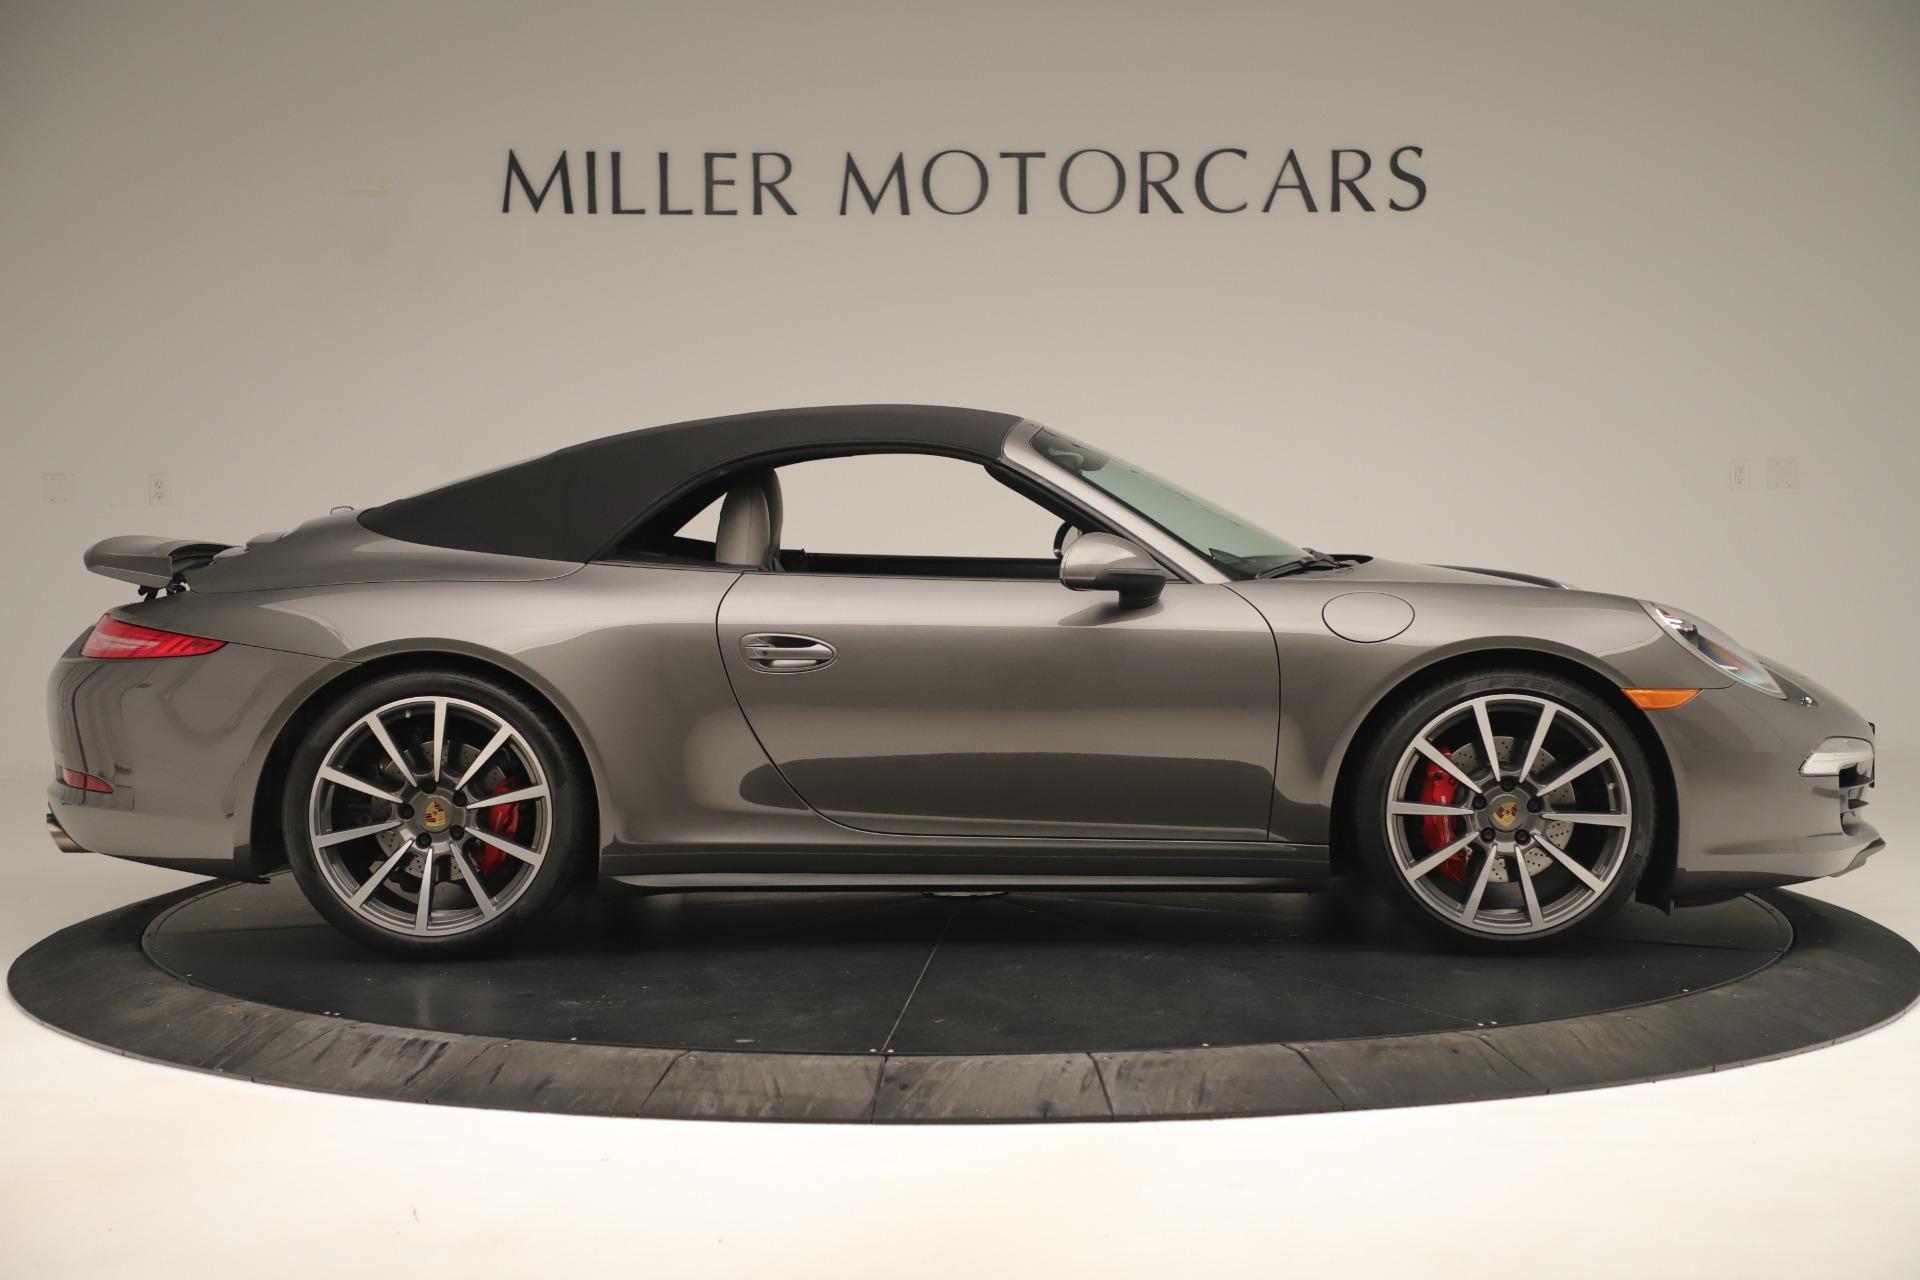 Used 2015 Porsche 911 Carrera 4S For Sale 98900 In Greenwich, CT